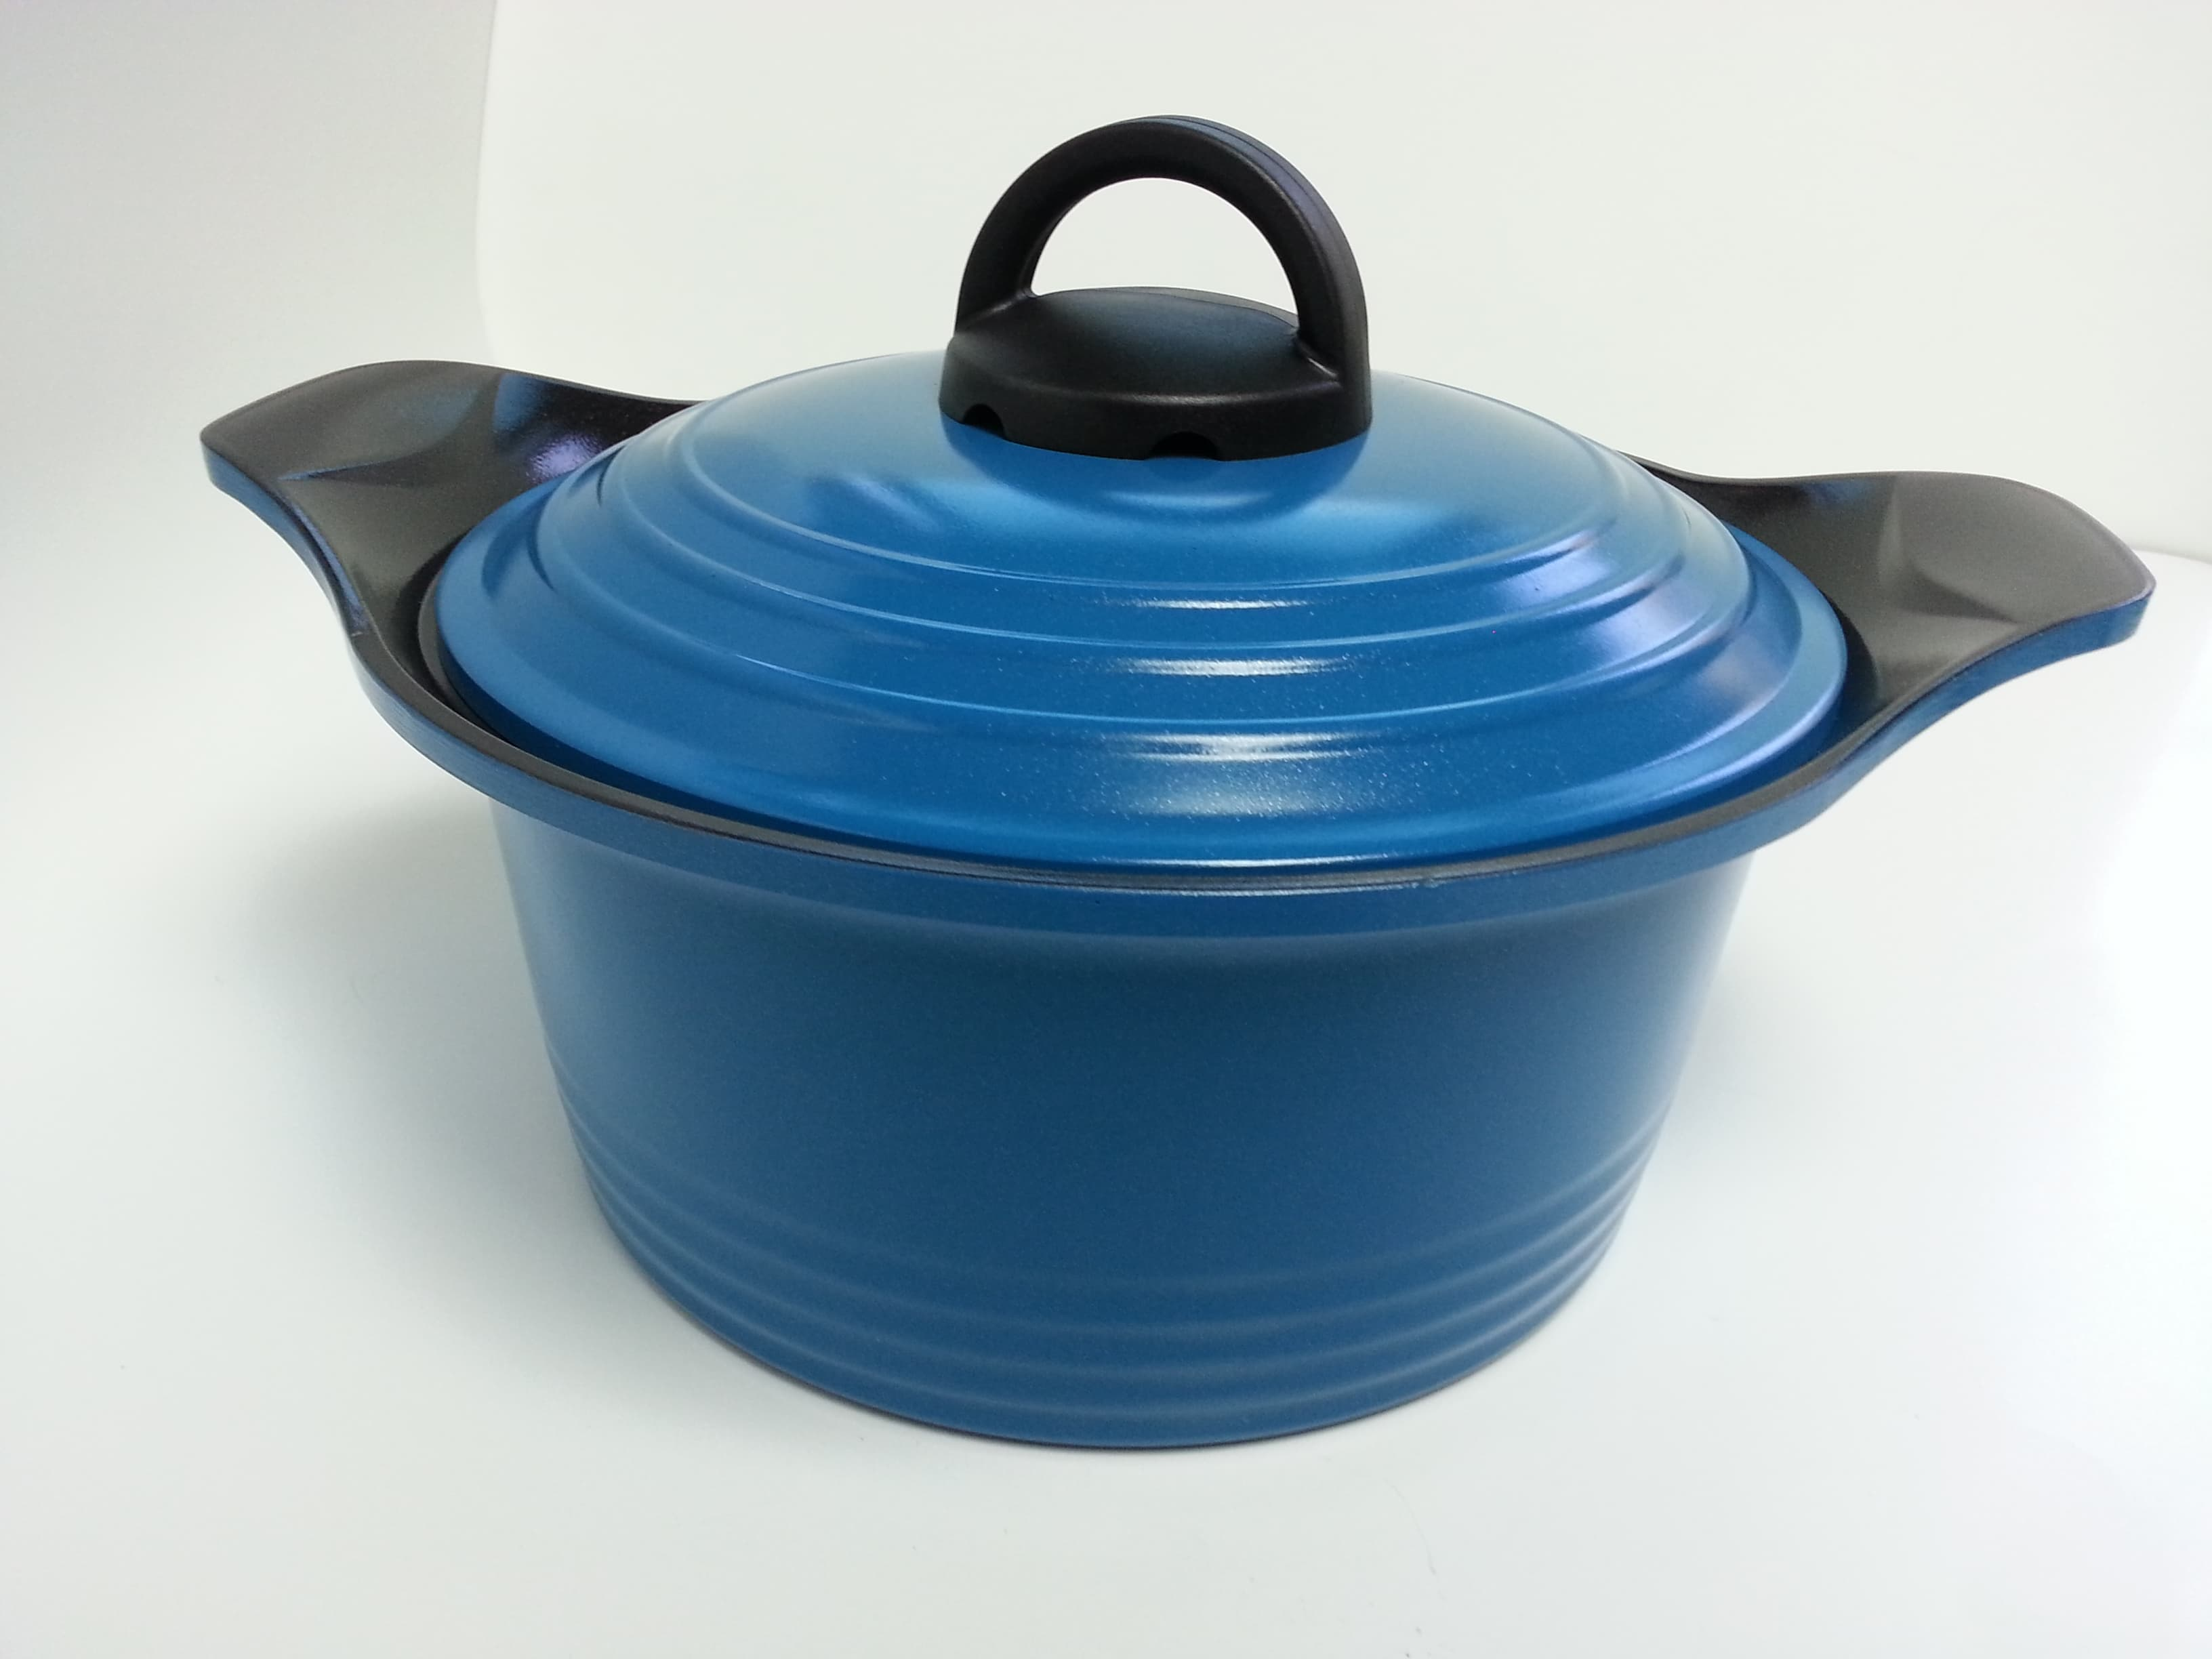 Ceramic Coated Aluminum Casting Cookware From Baishan